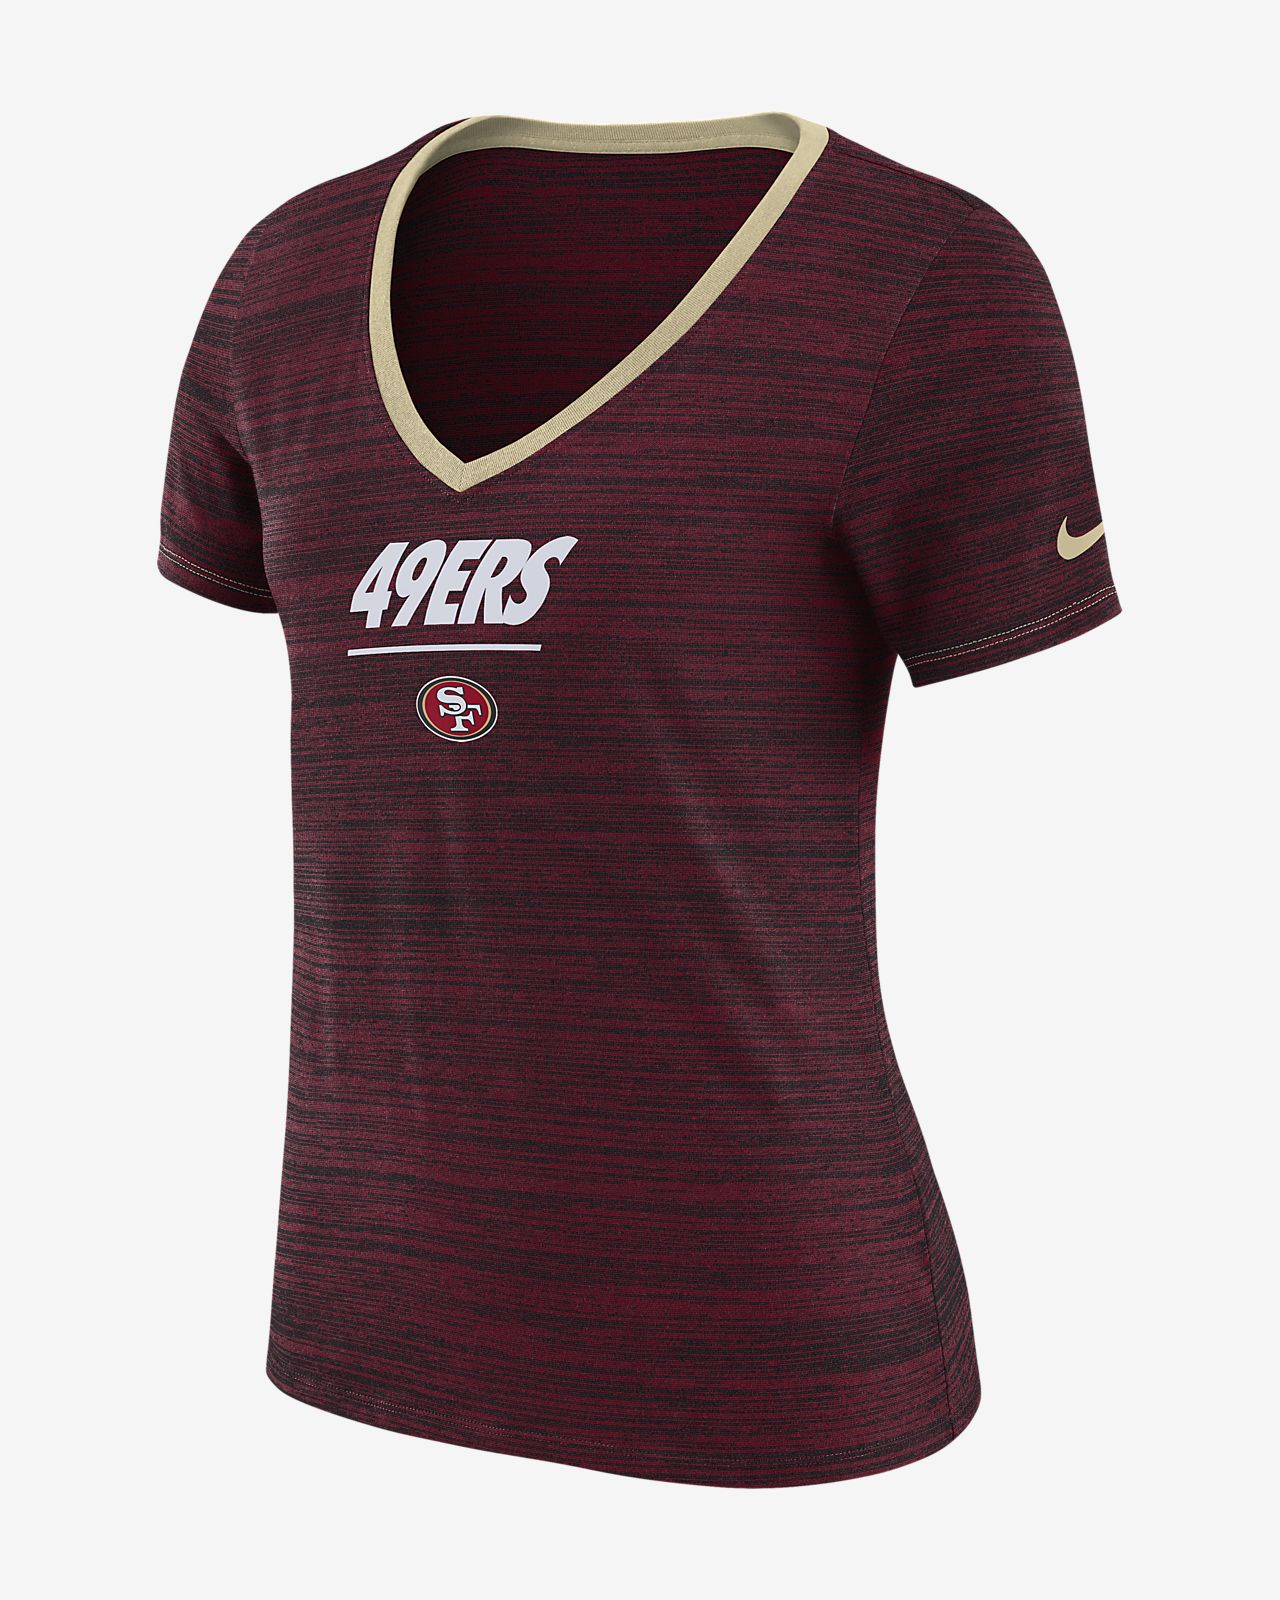 ed5b1fb0080b Nike Dri-FIT Legend (NFL 49ers) Women s T-Shirt. Nike.com